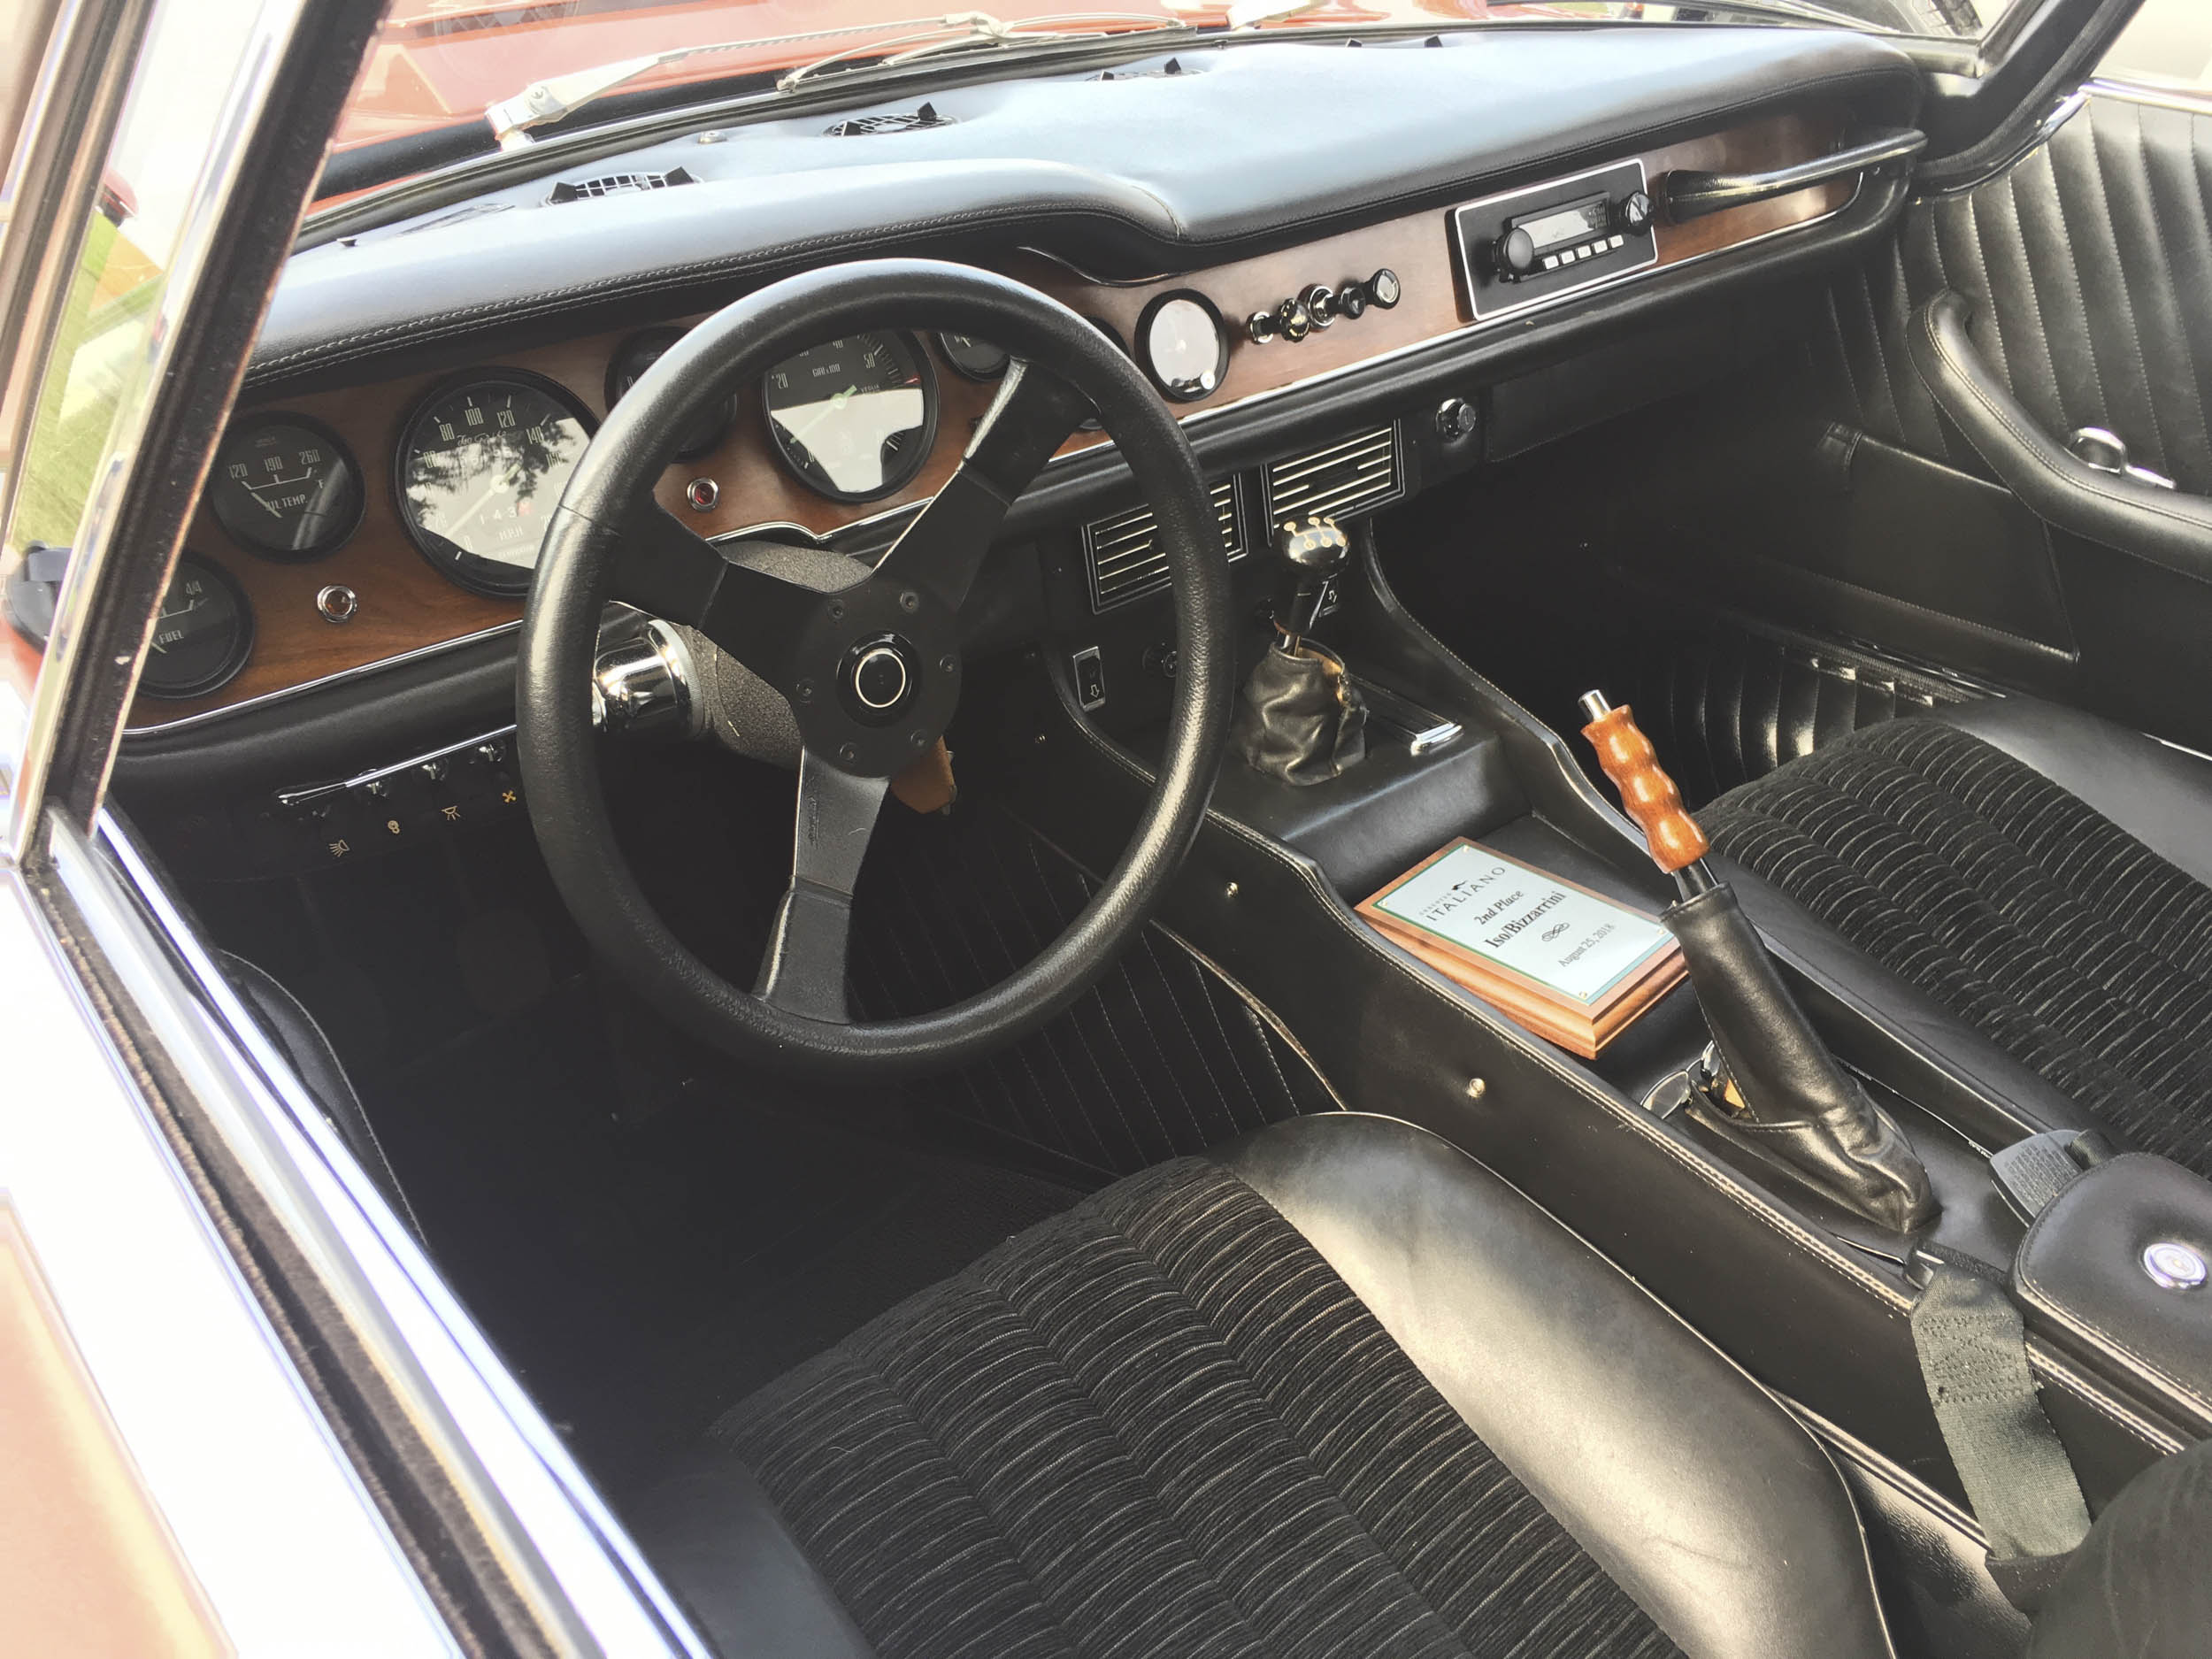 1974 Iso Grifo interior